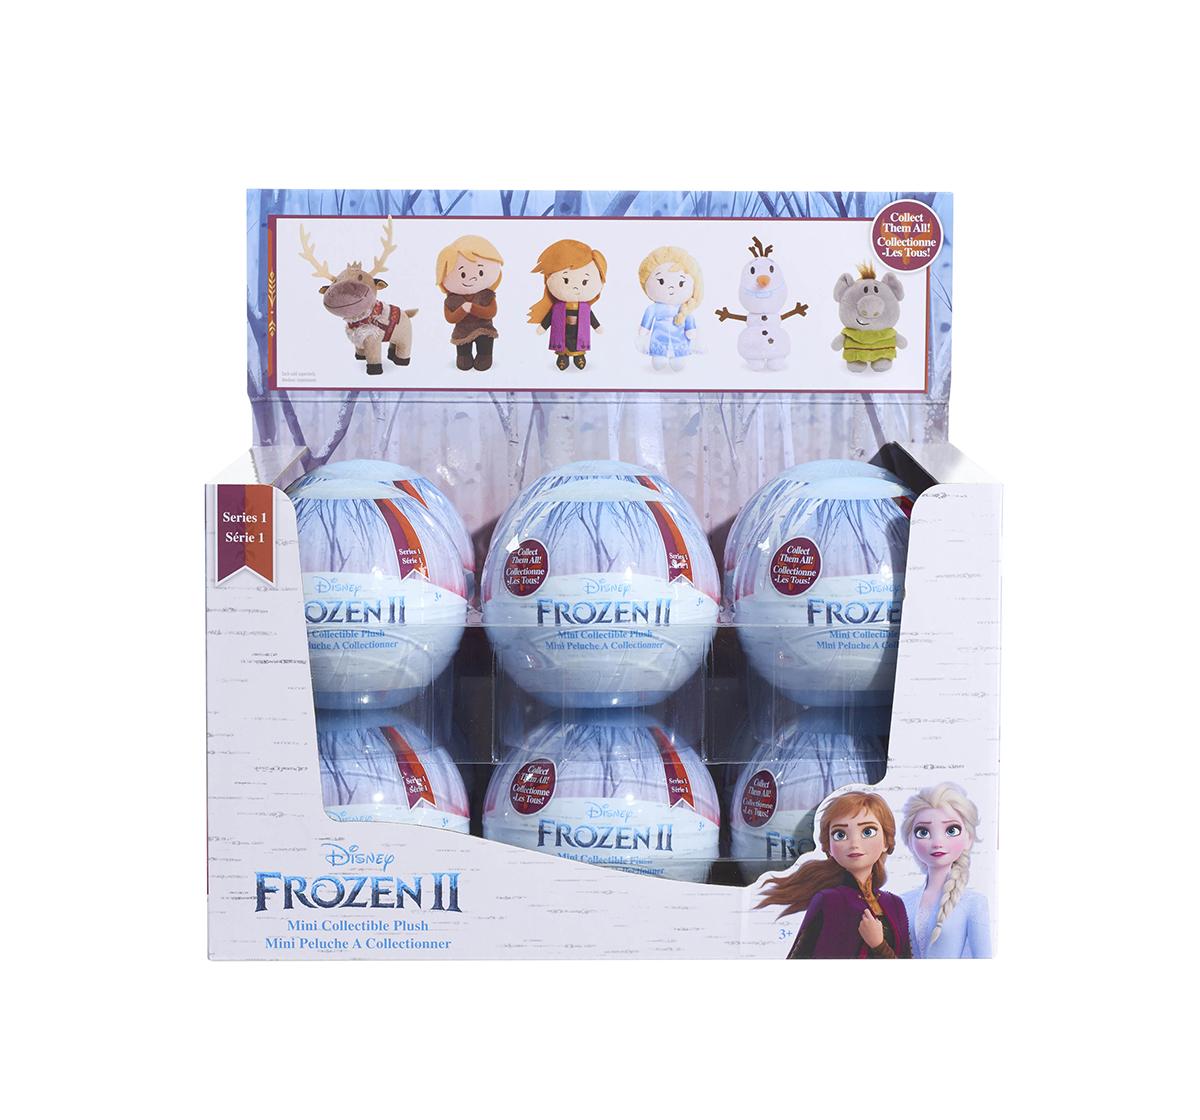 Disney   Disney Frozen2 Mini Capsule Plush Character Soft Toys for Girls age 5Y+ - 10.16 Cm